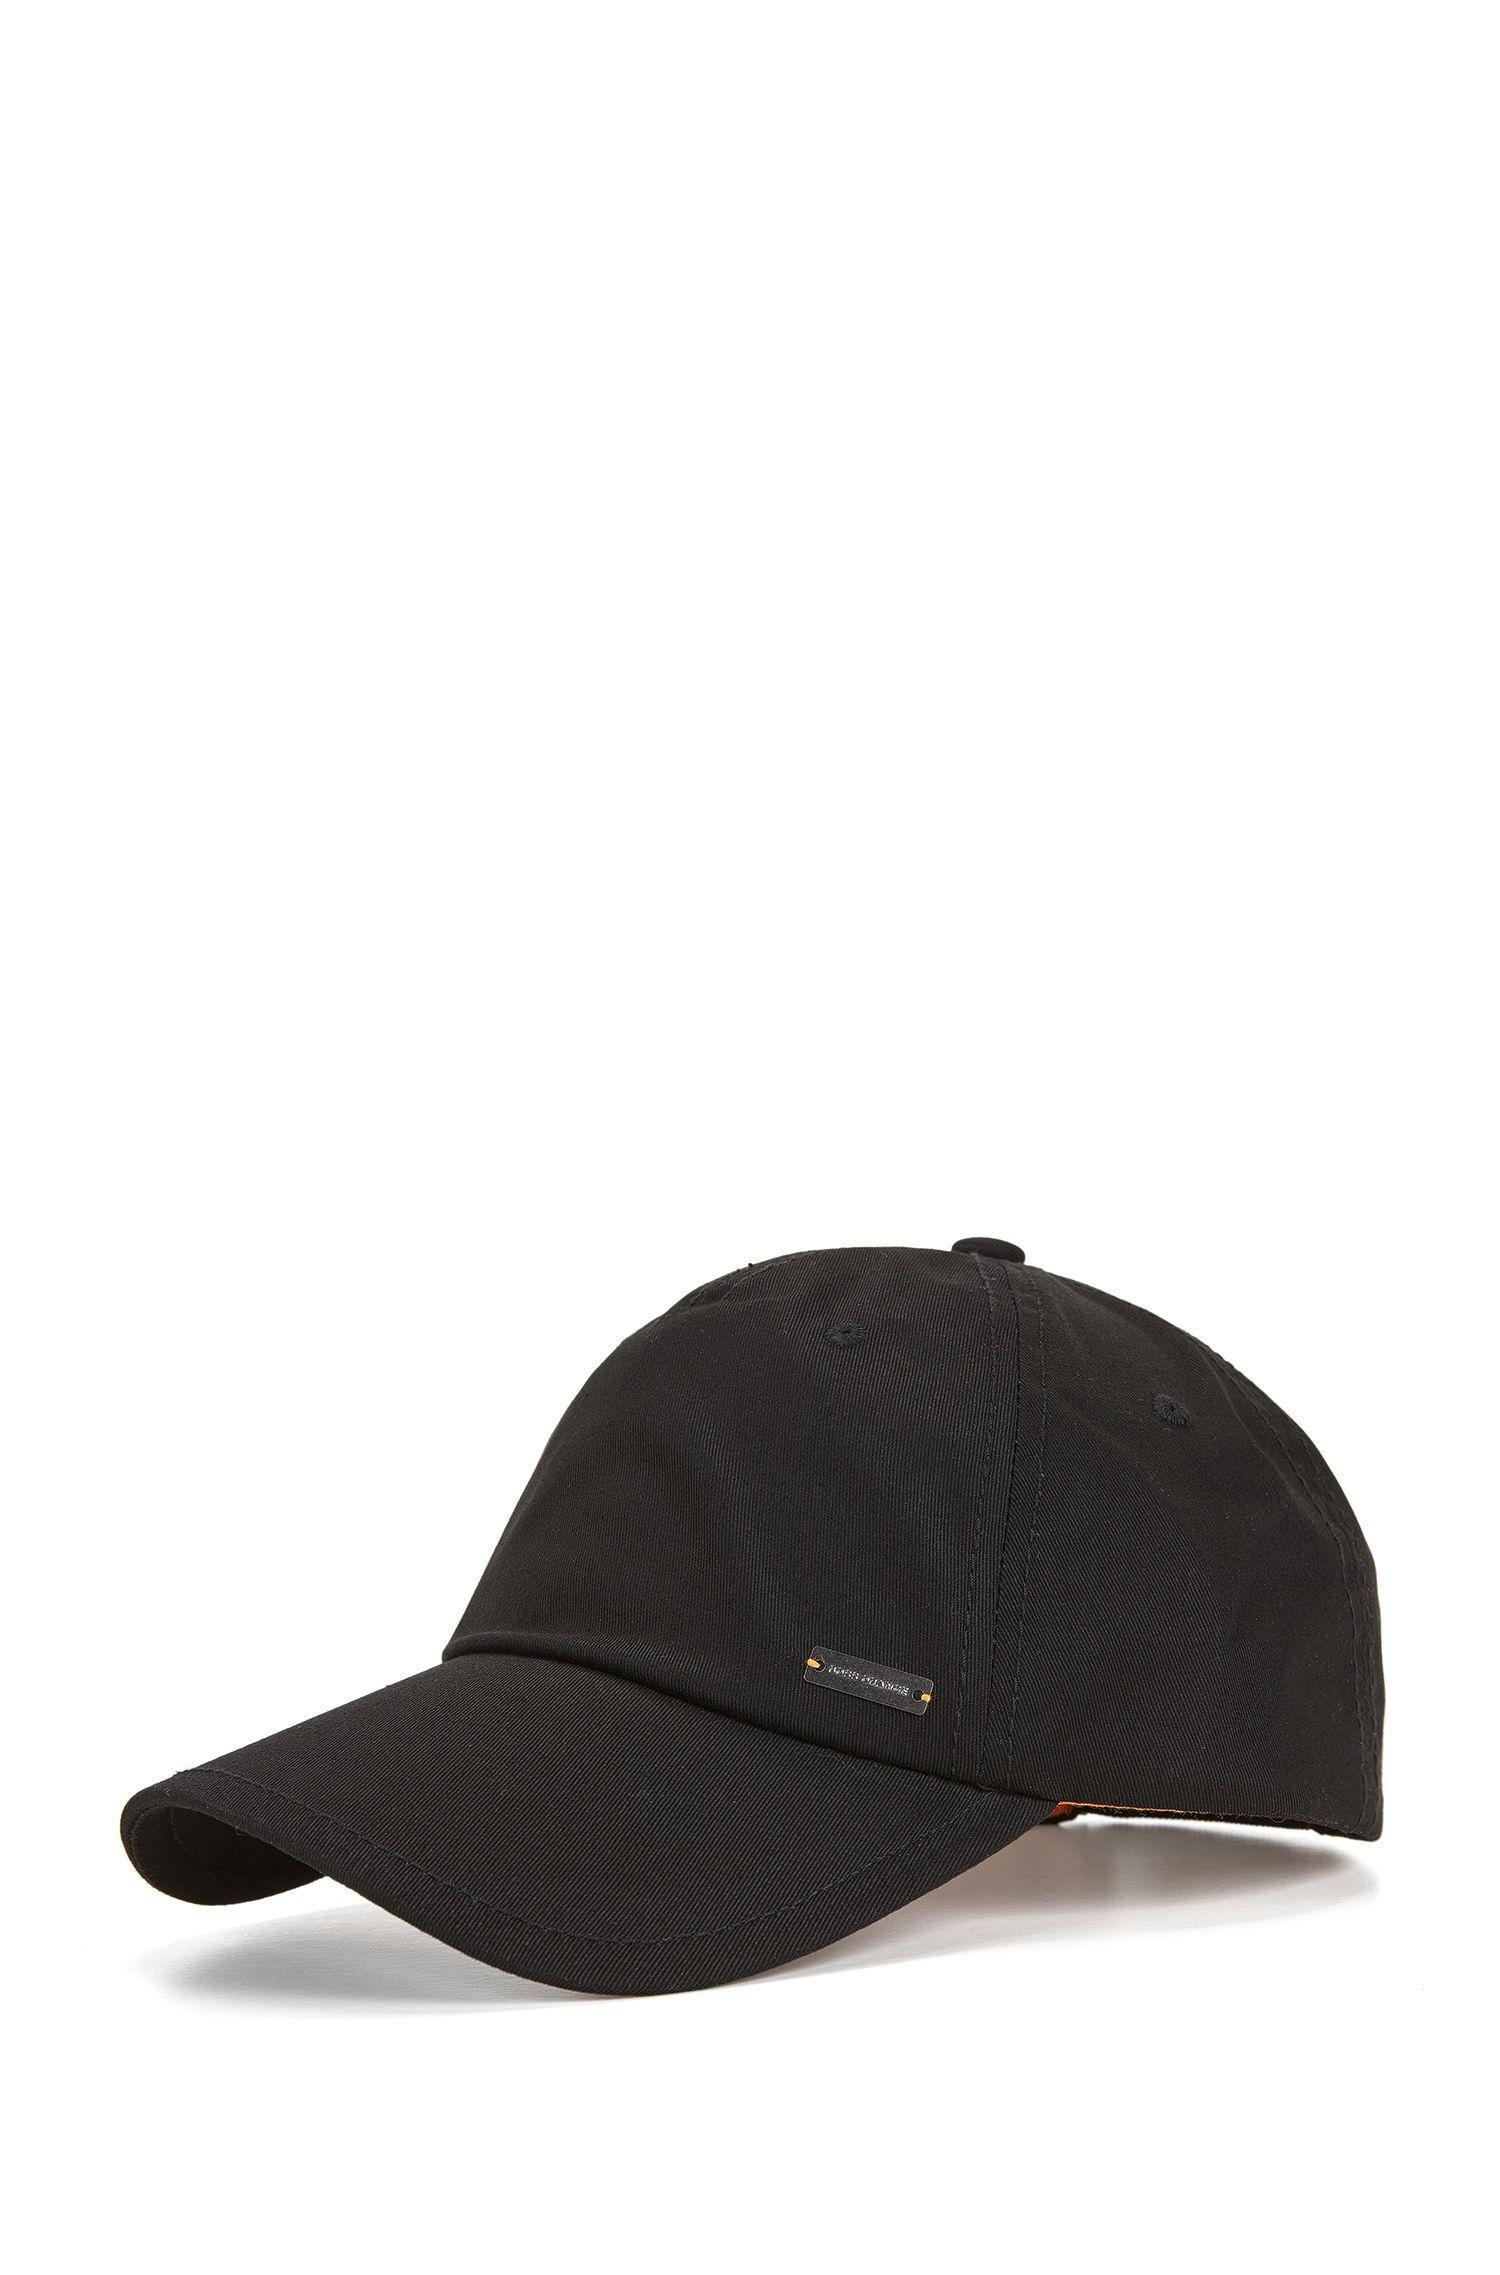 Verstellbare Baseball Cap aus Baumwoll-Twill